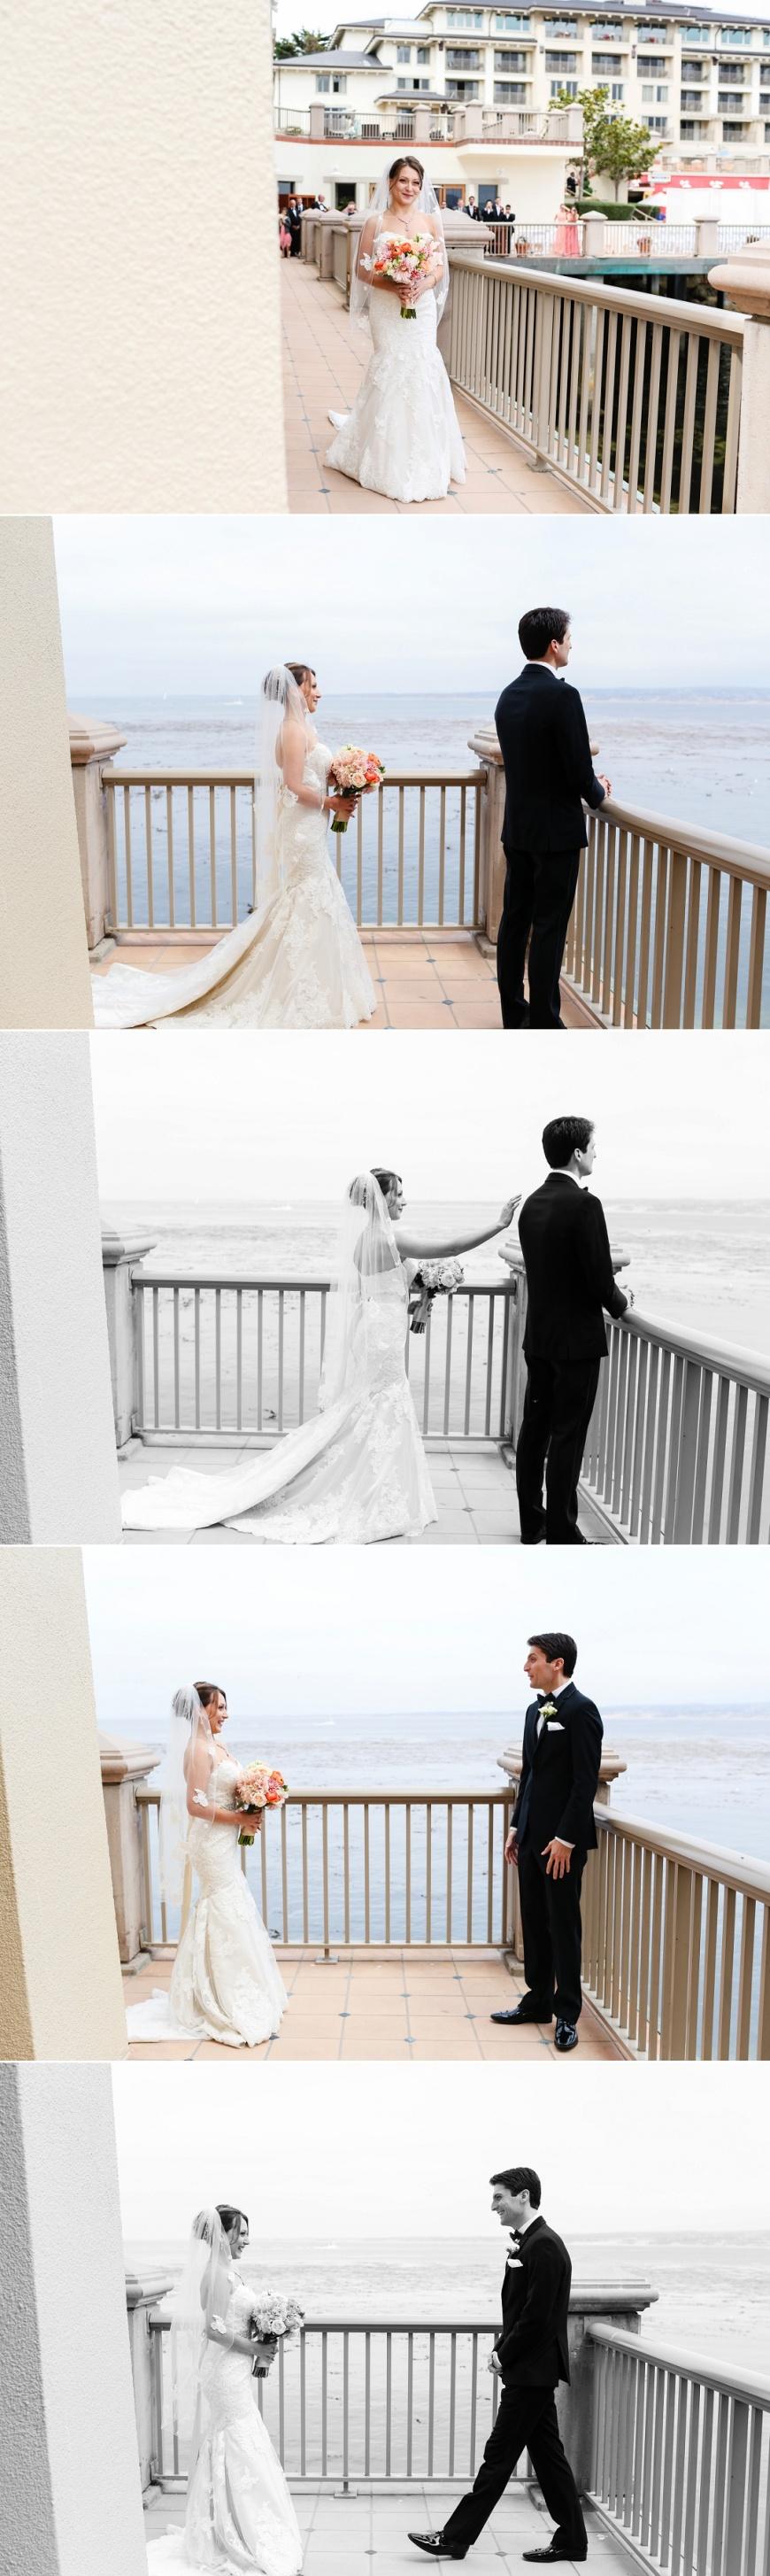 Monterey-Plaza-Hotel-Wedding-Photographer_1025.jpg